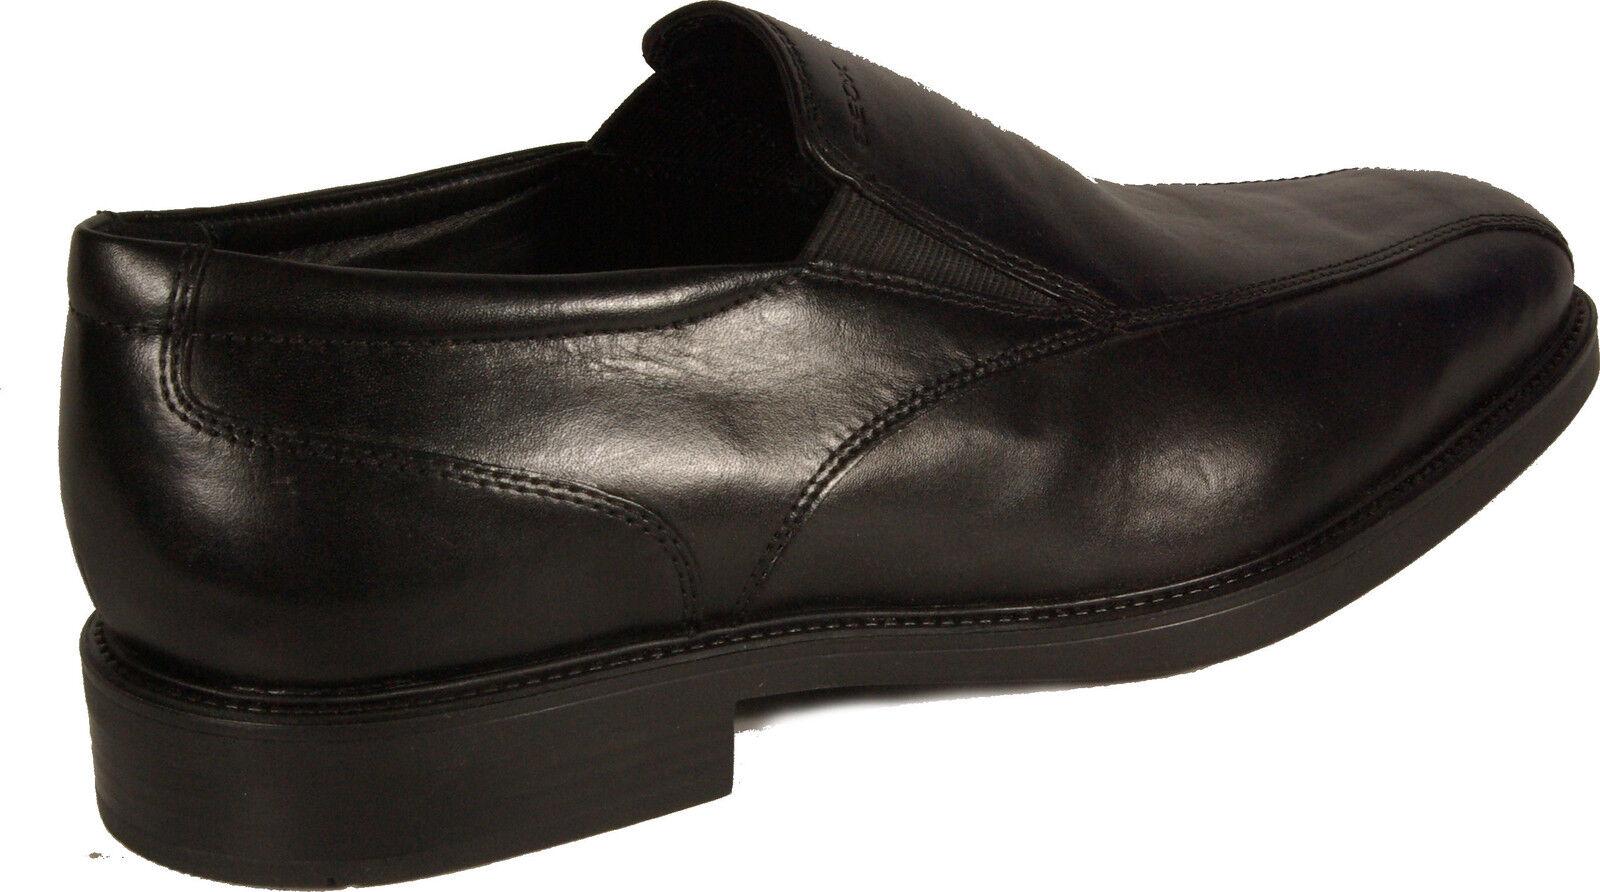 GEOX GEOX GEOX Schuhe Slipper Business schwarz Mod. U LONDRA Gummisohle Leder NEU ff1a0d